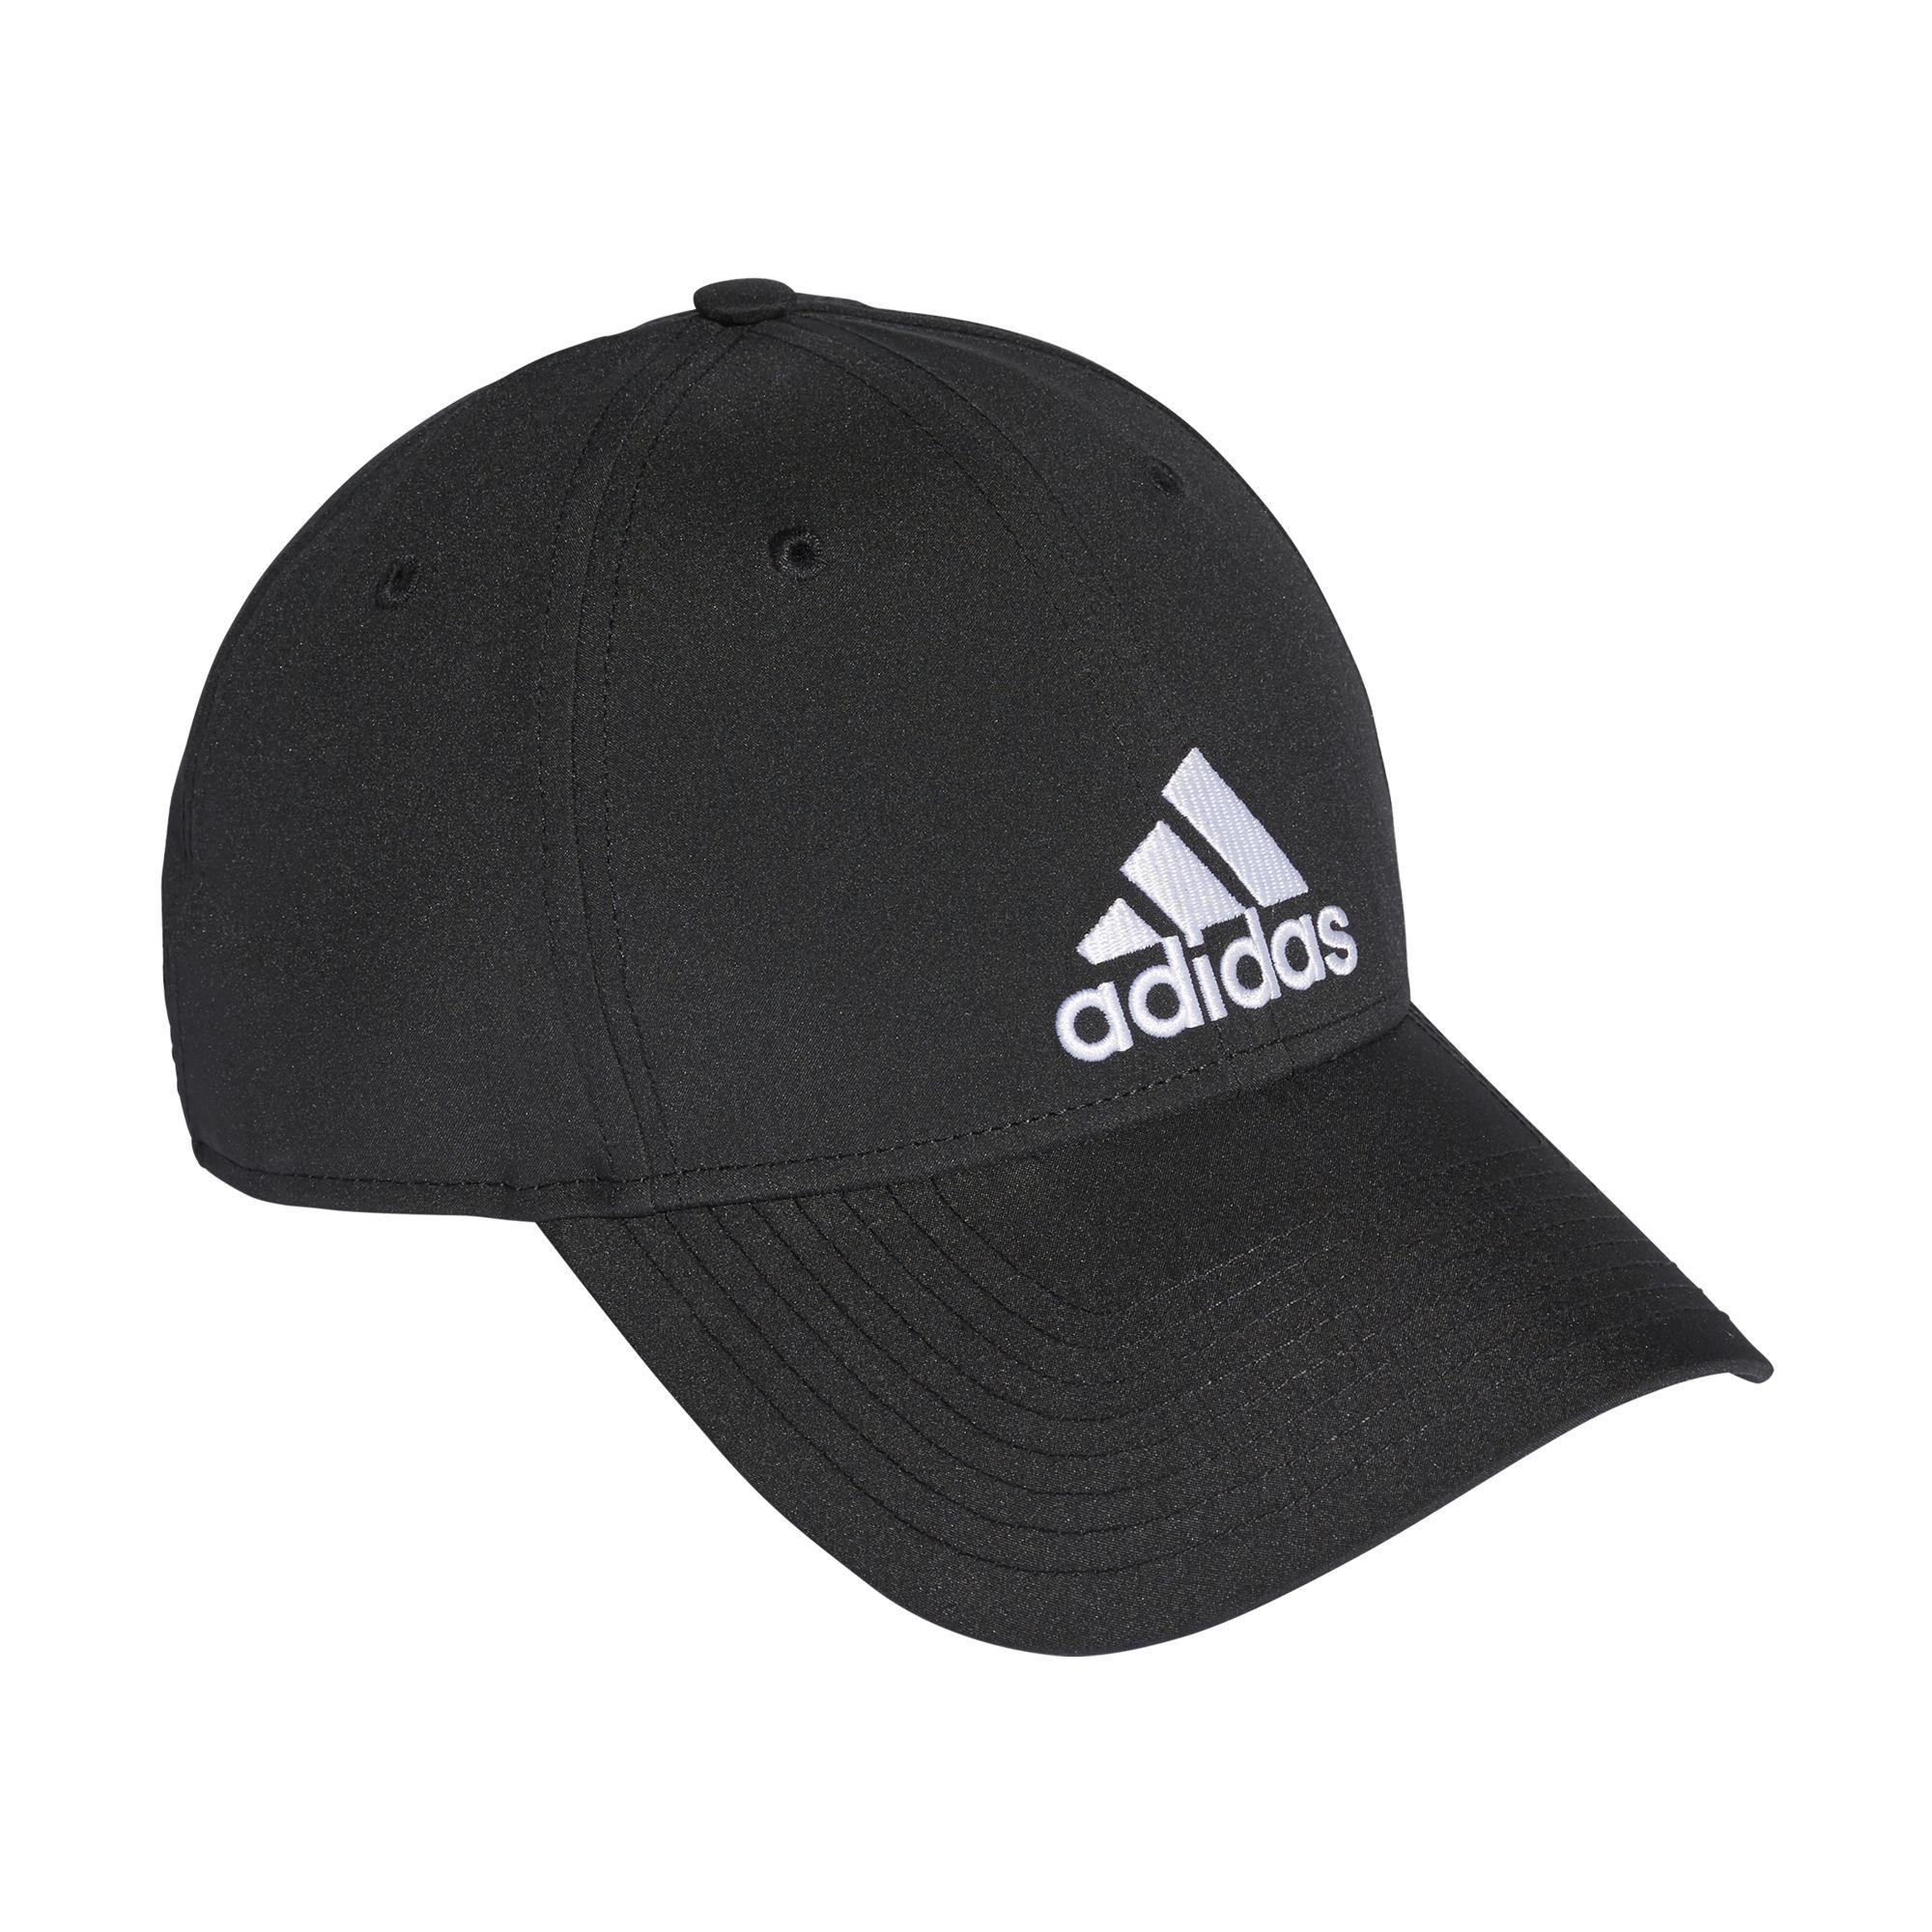 Adidas unisex baseball sapka 6PCAP LTWGT EMB ... a794e2d6a2